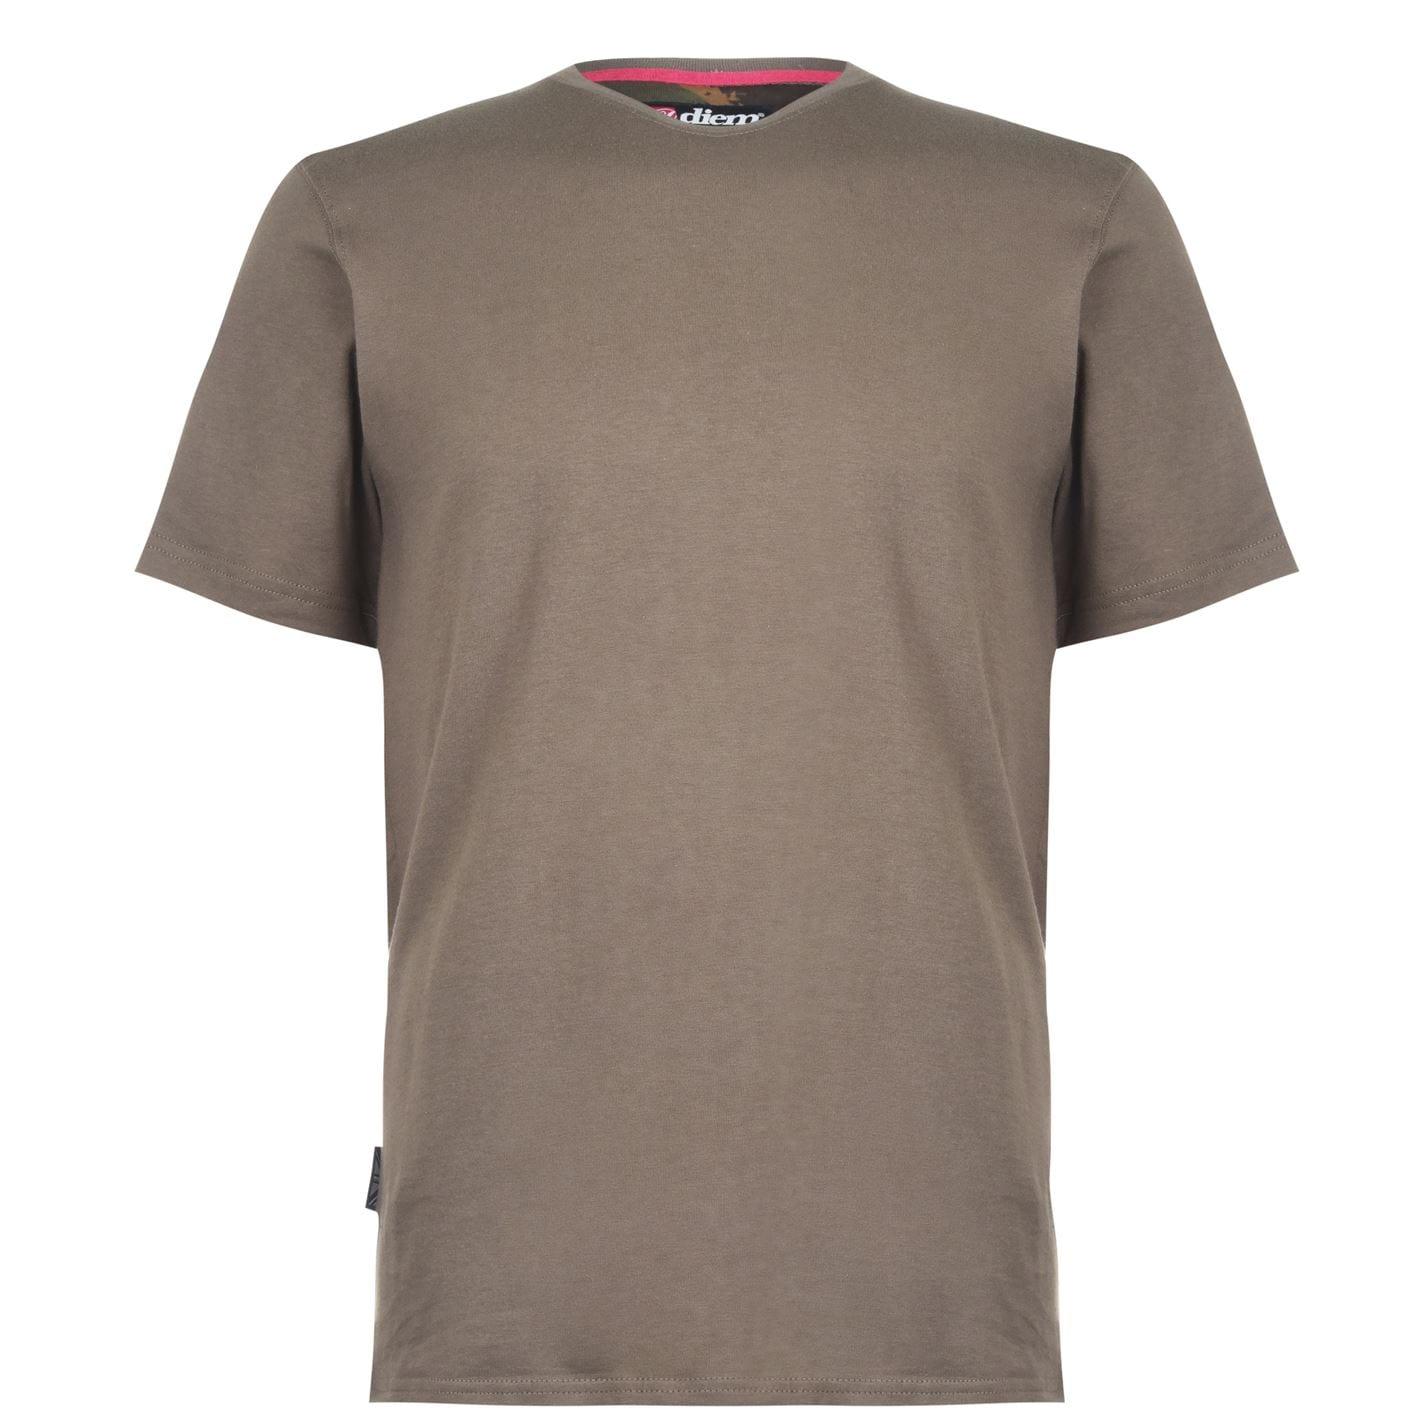 Diem Small Logo Tee Shirt Green